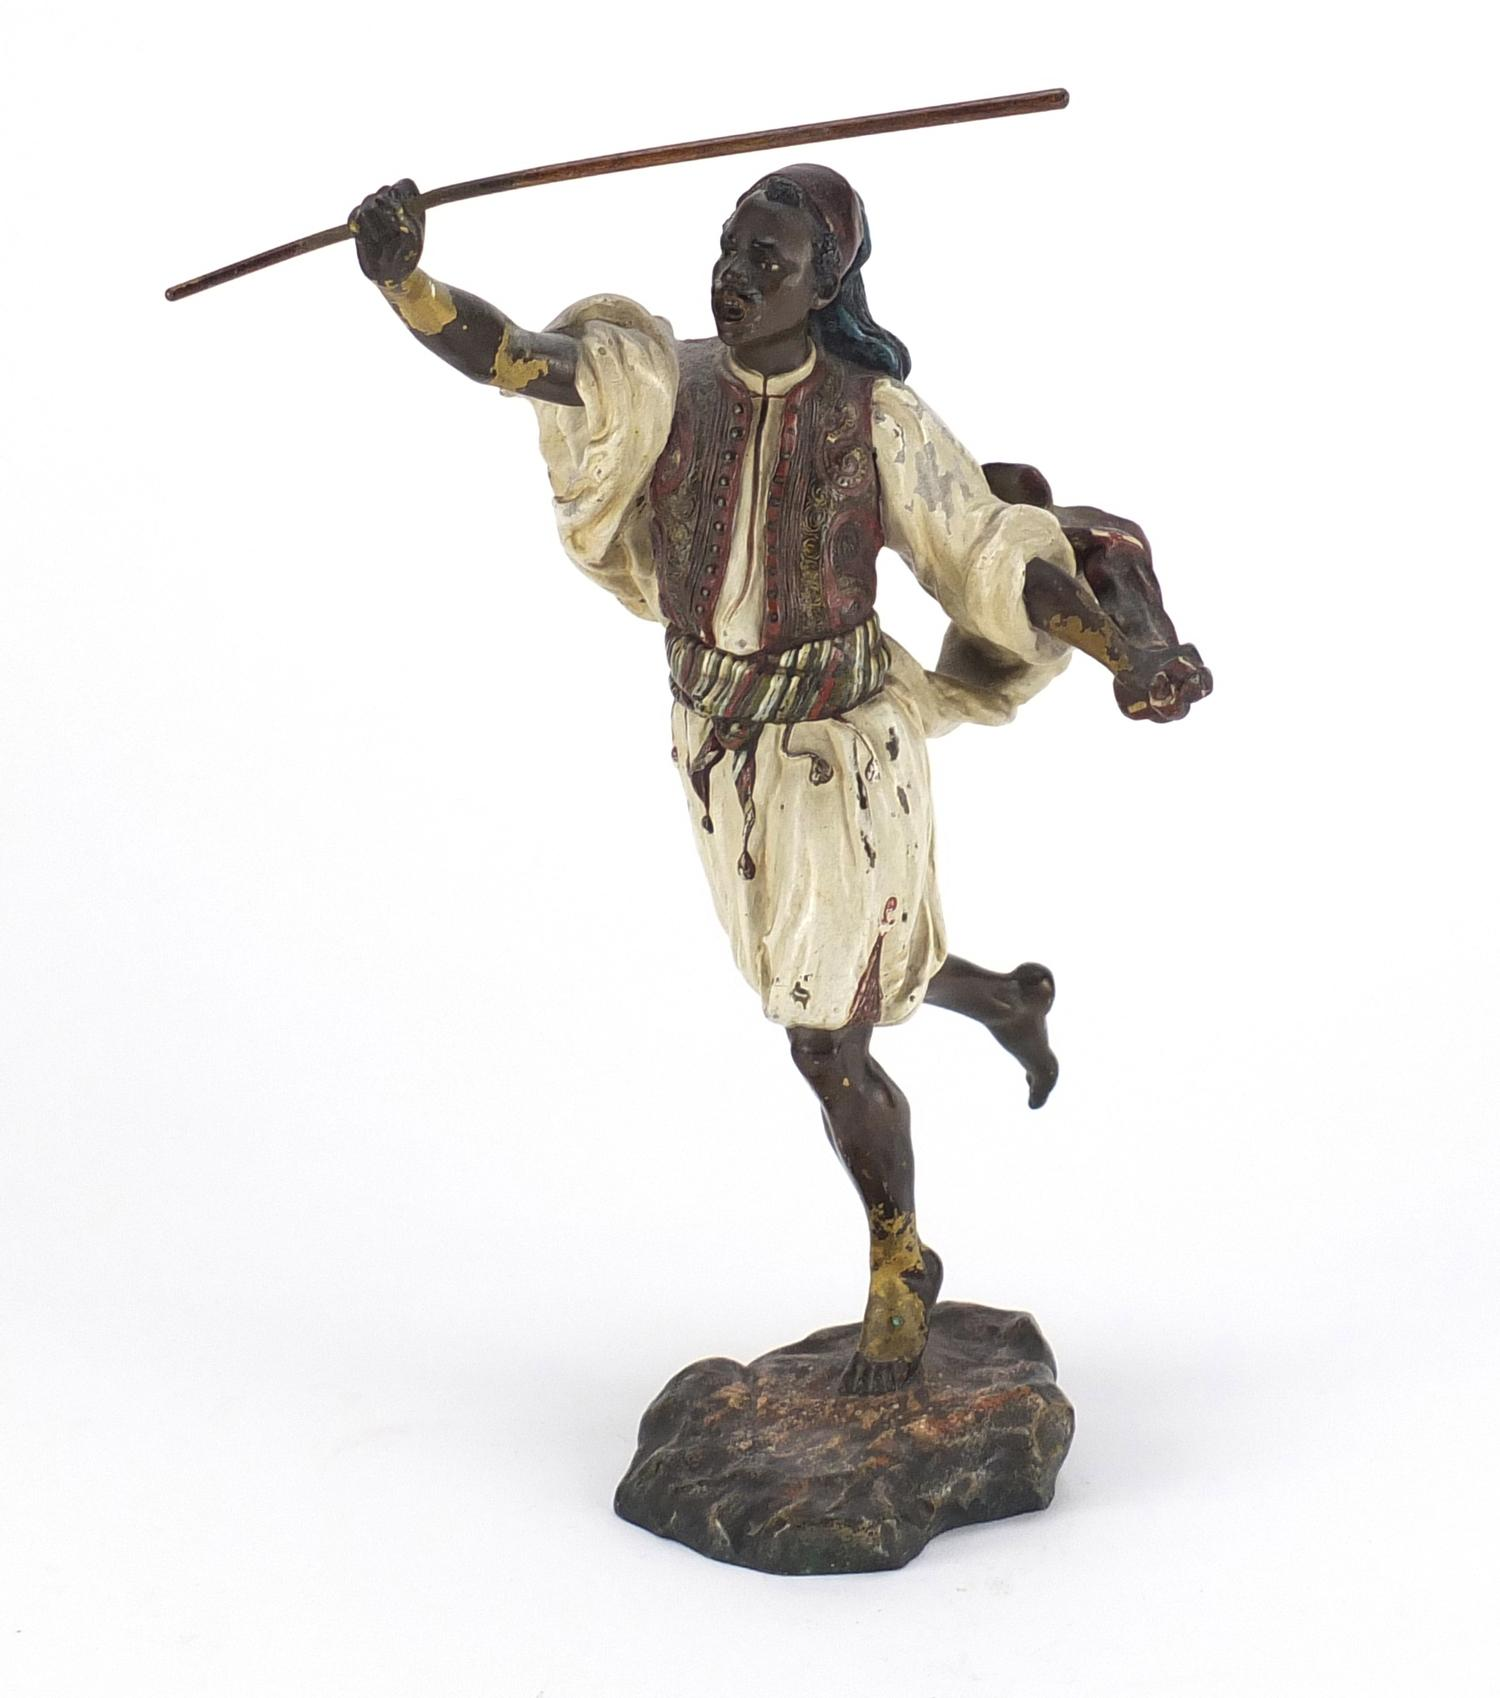 Lot 5 - Franz Xaver Bergmann, large Austrian cold painted bronze figure of an Arab huntsman, impressed marks